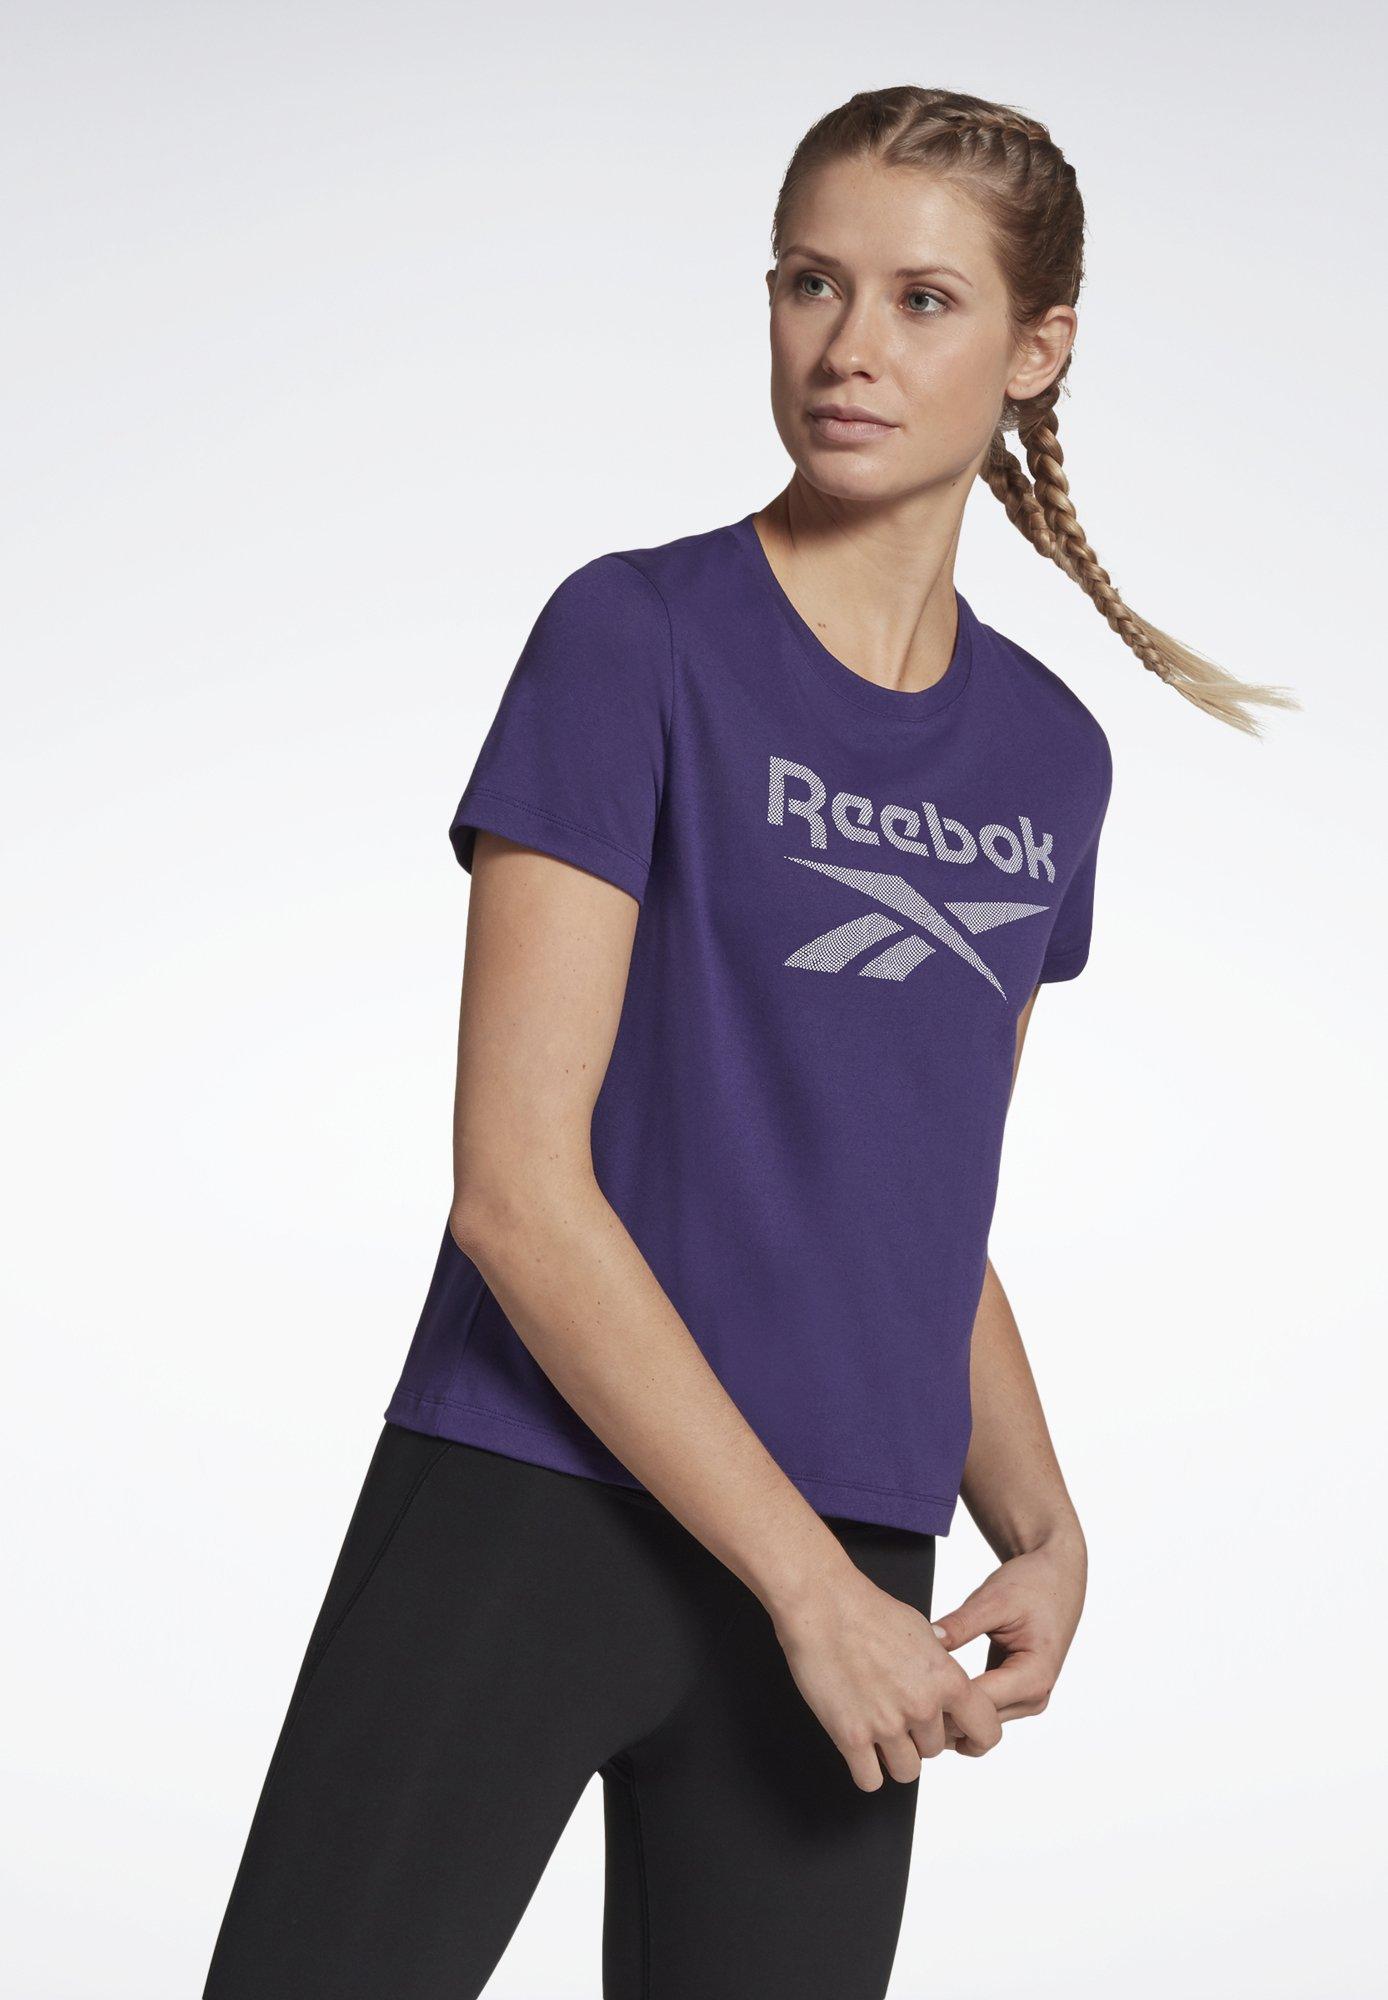 Femme WORKOUT READY SUPREMIUM BIG LOGO T-SHIRT - T-shirt imprimé